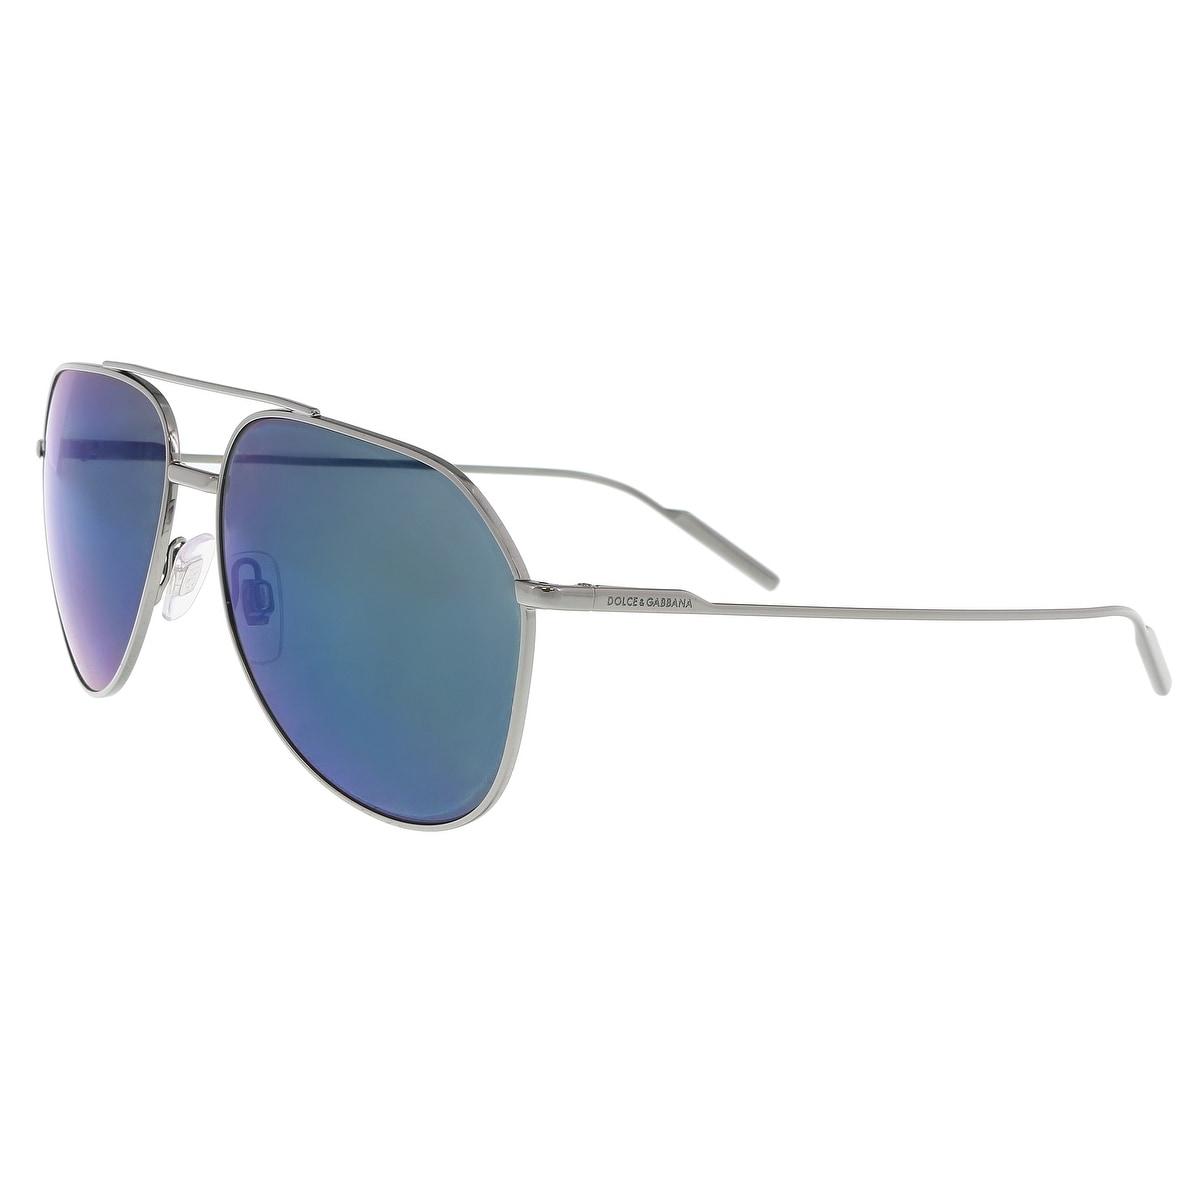 aacb0dcbeeb Dolce   Gabbana Sunglasses